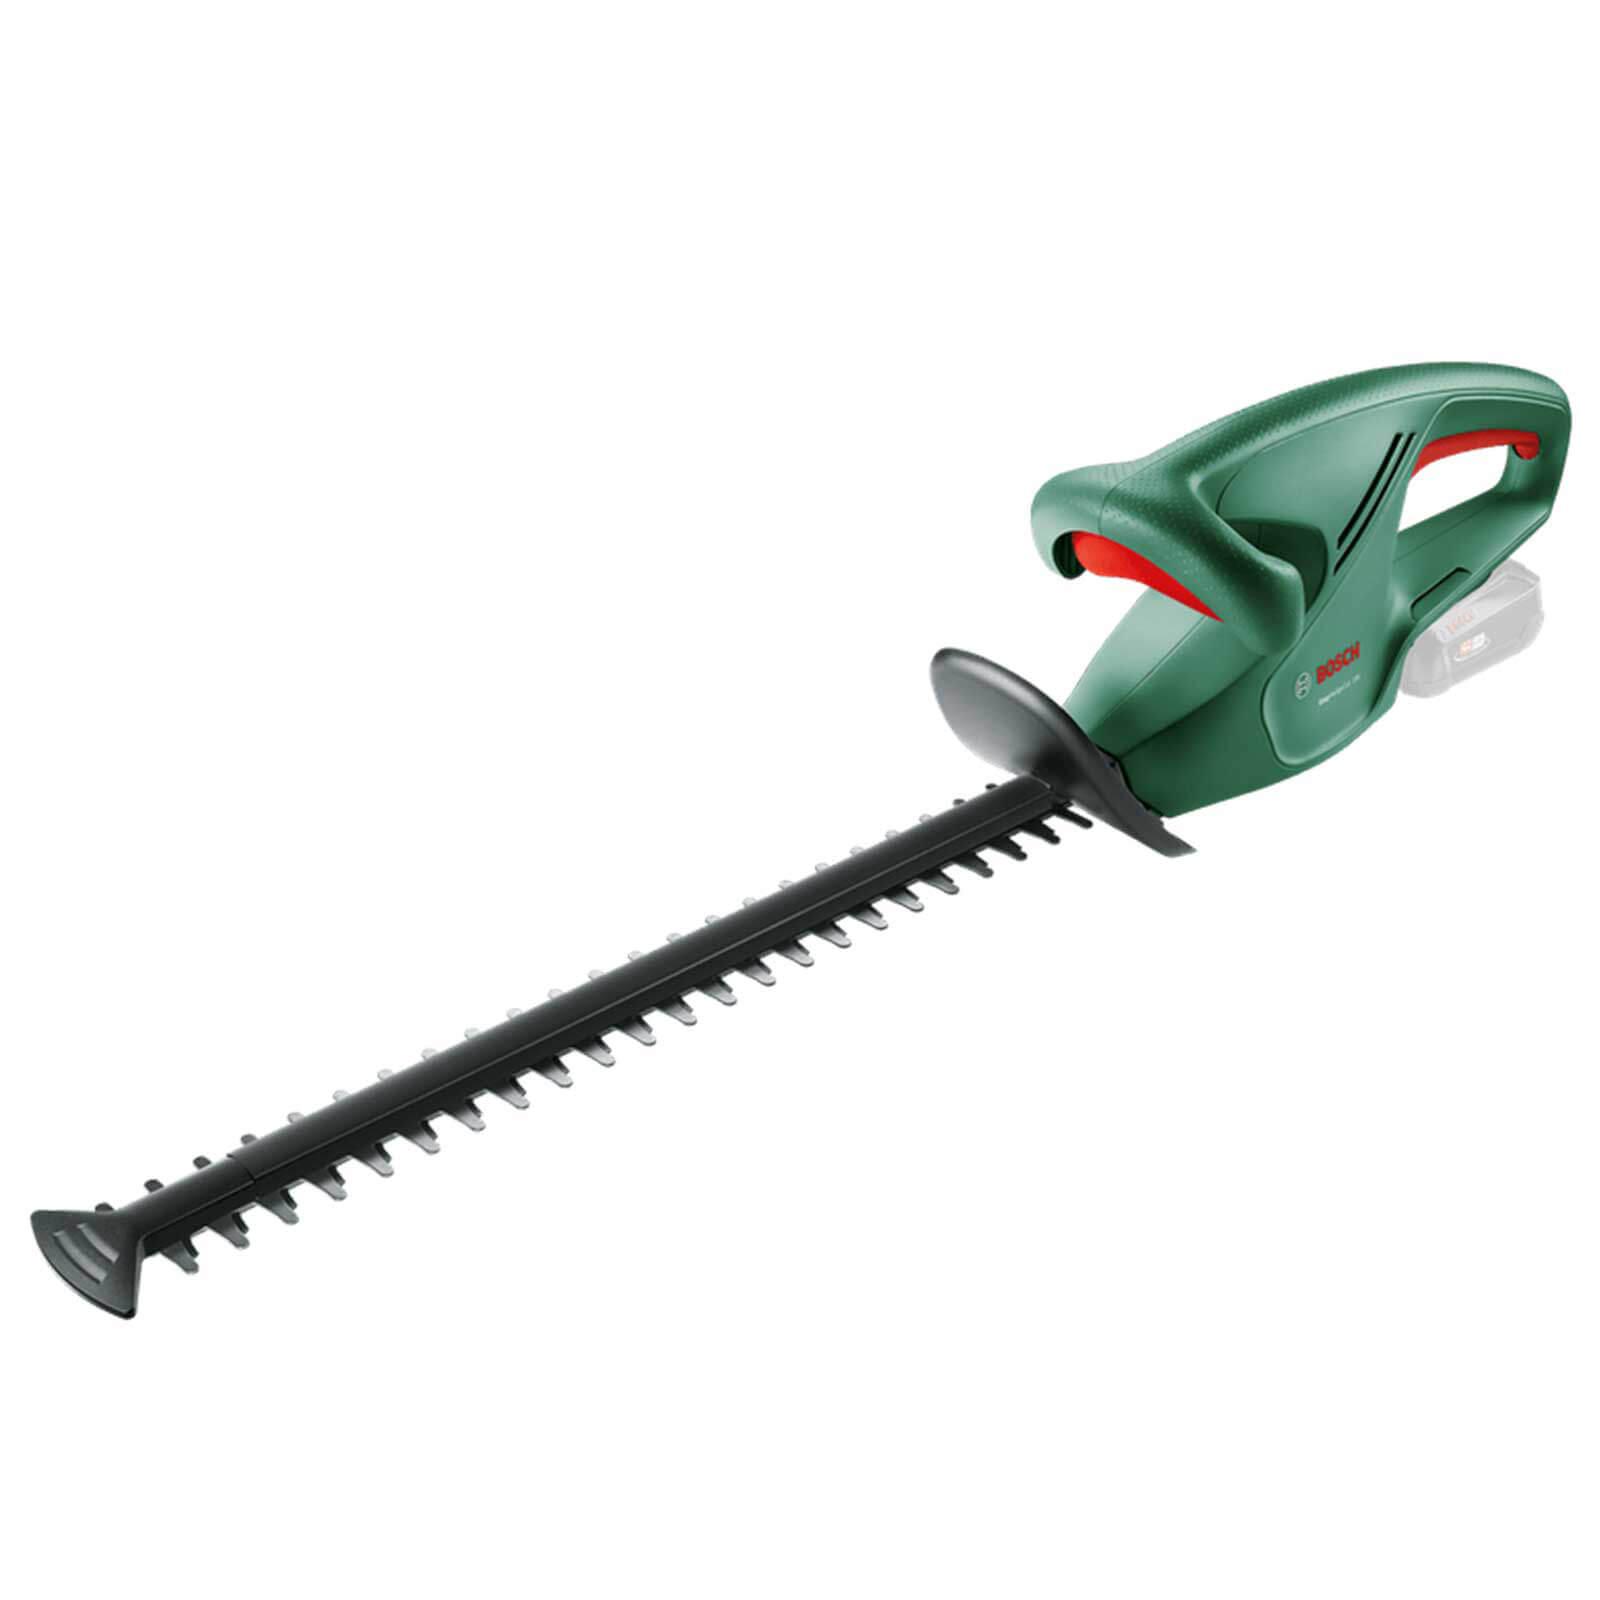 Bosch EASYHEDGECUT 18-45 18v Cordless Hedge Trimmer 450mm No Batteries No Charger